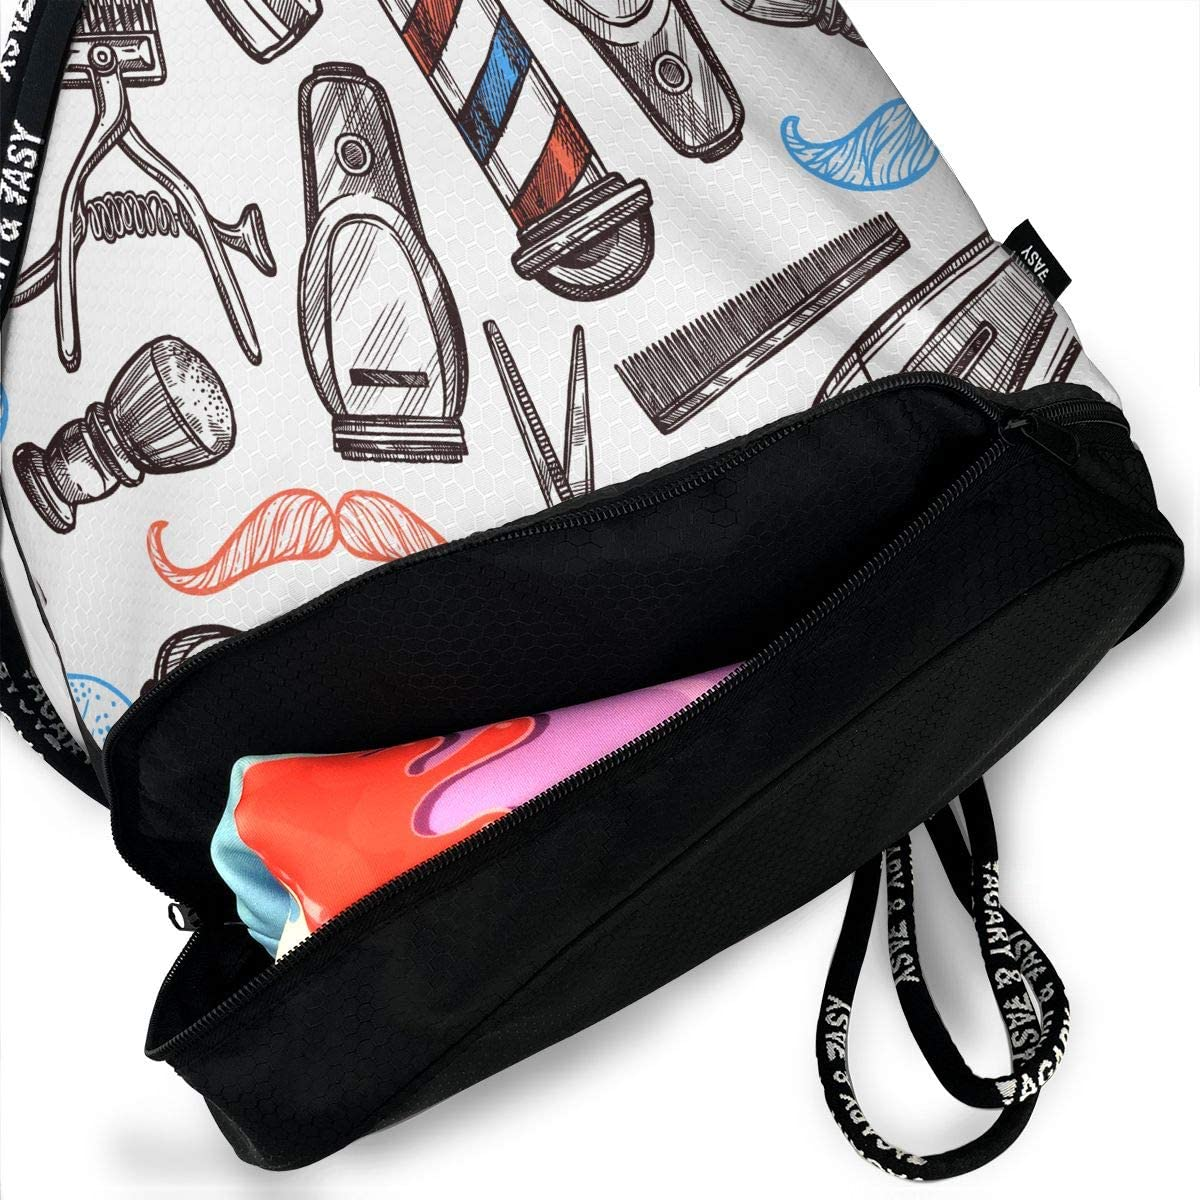 Drawstring Backpack Barbershop Equipment Gym Bag